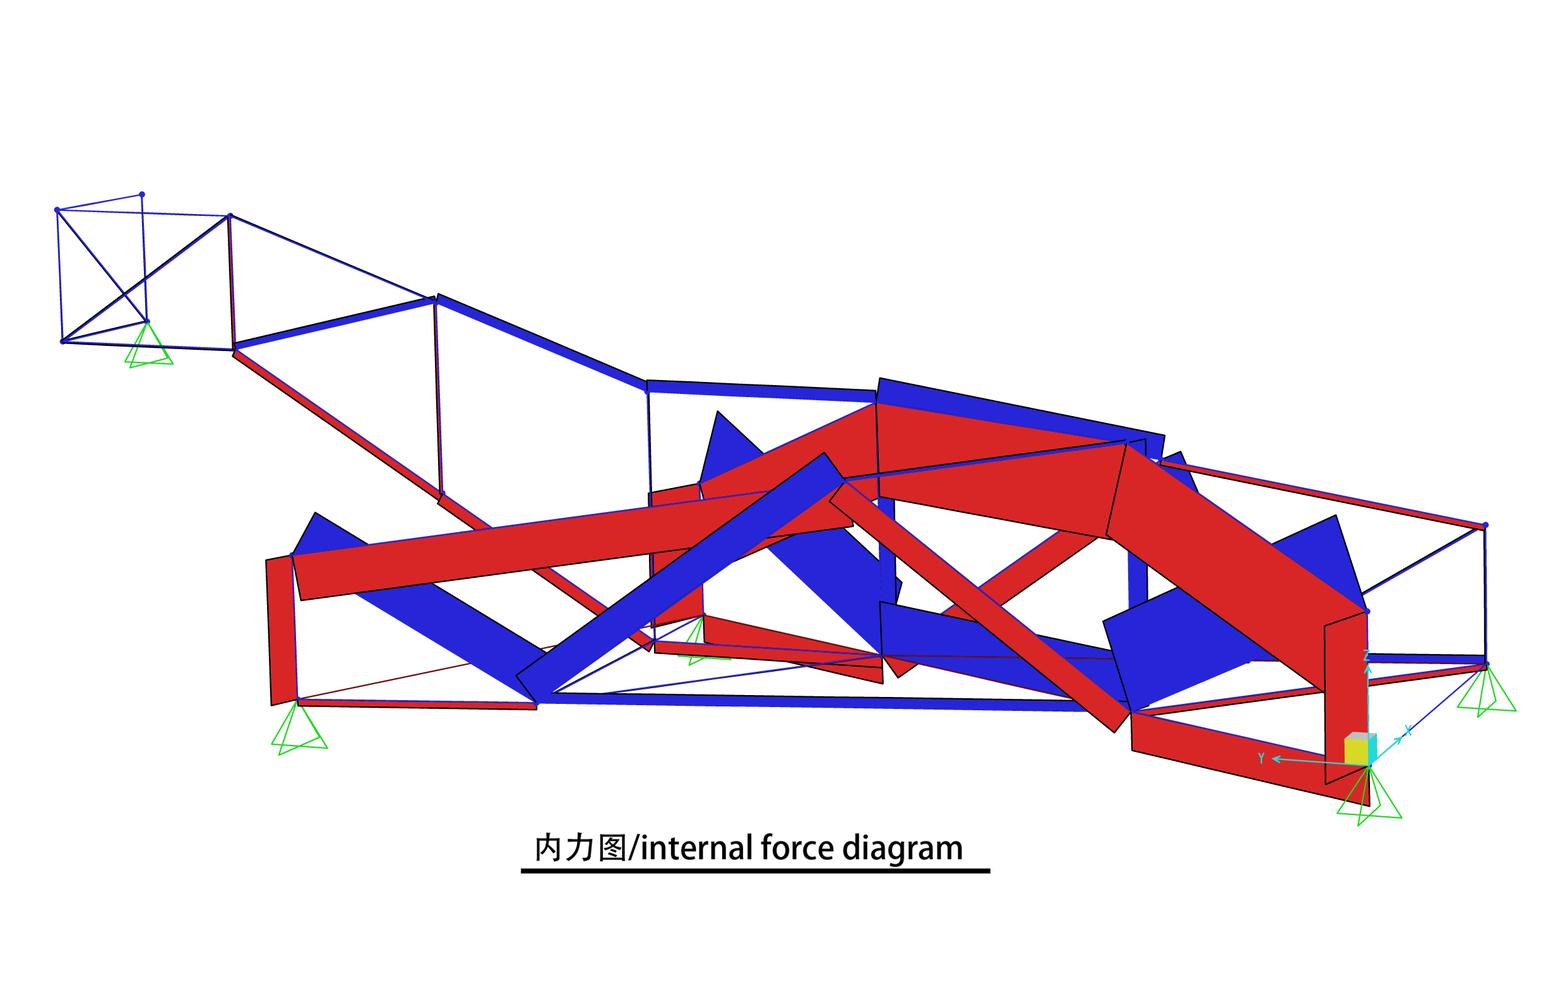 hight resolution of x bridge atelier groundwork architecture internal force diagram